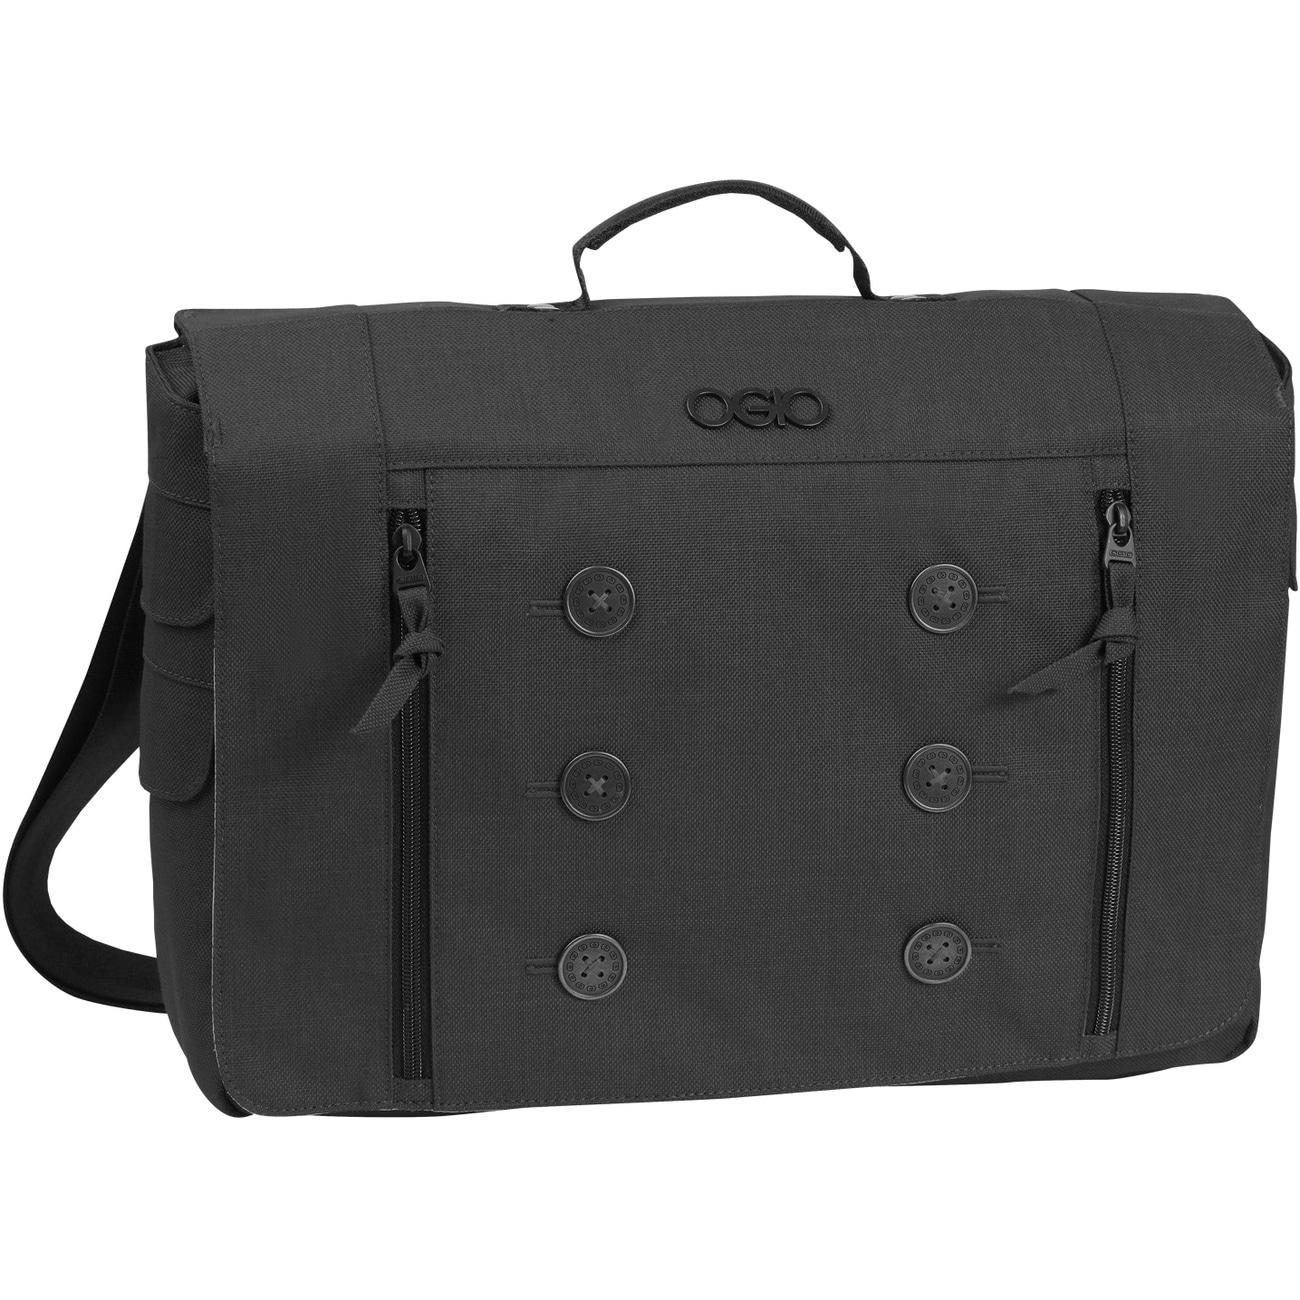 Ogio Manhattan Black 15-inch Laptop Messenger Bag